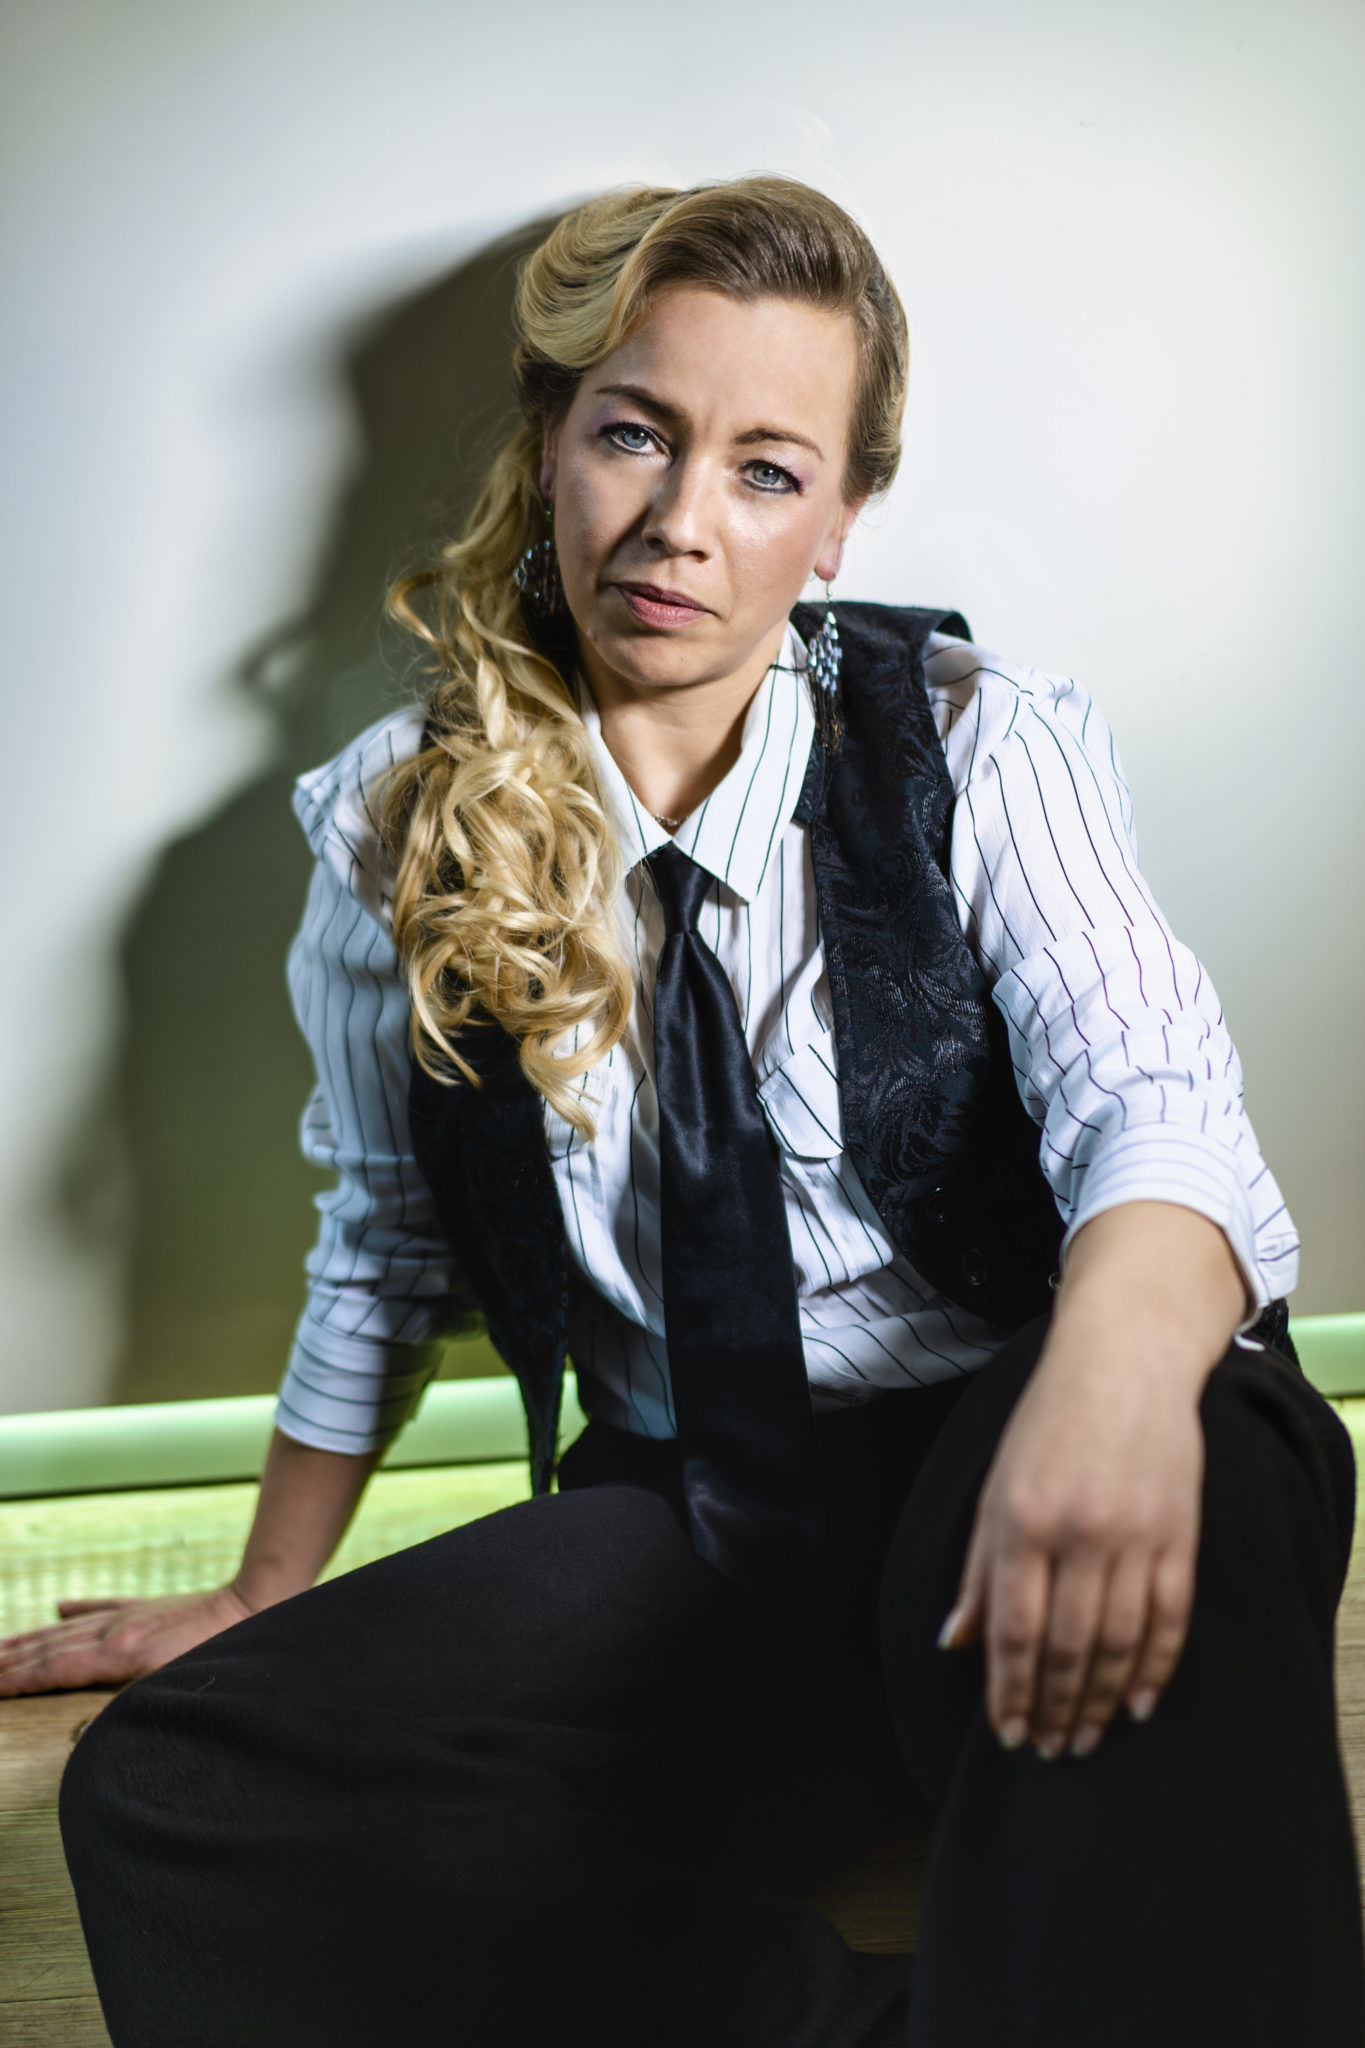 Frisörsalon Katja Cisar - 106